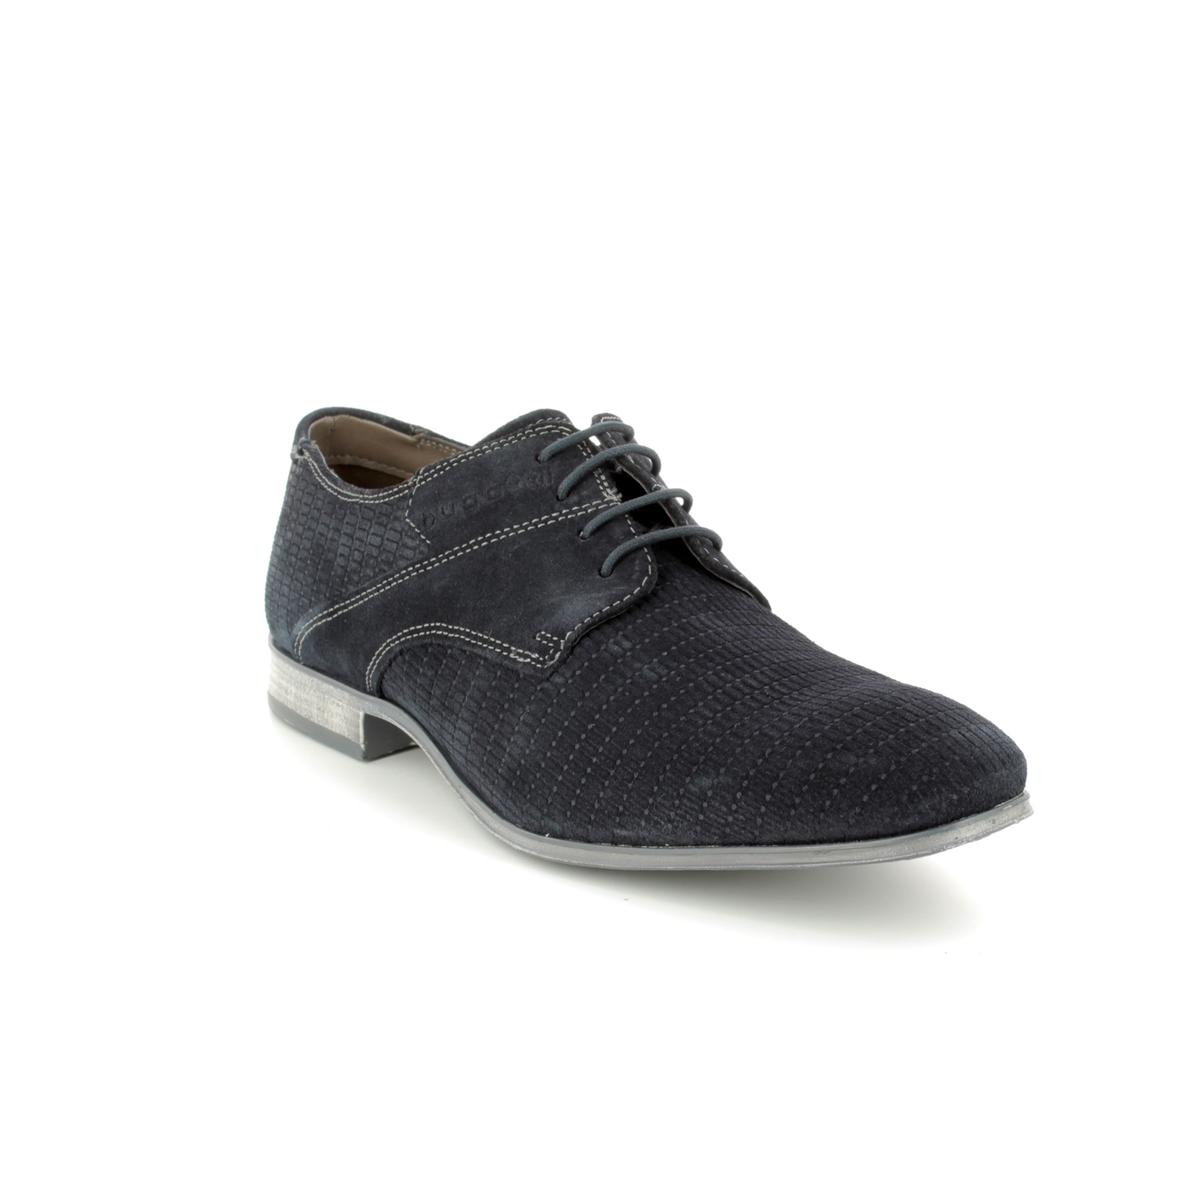 9de7afdd3d695 Bugatti Fashion Shoes - Navy suede - 31125208/4100 MOSARIO